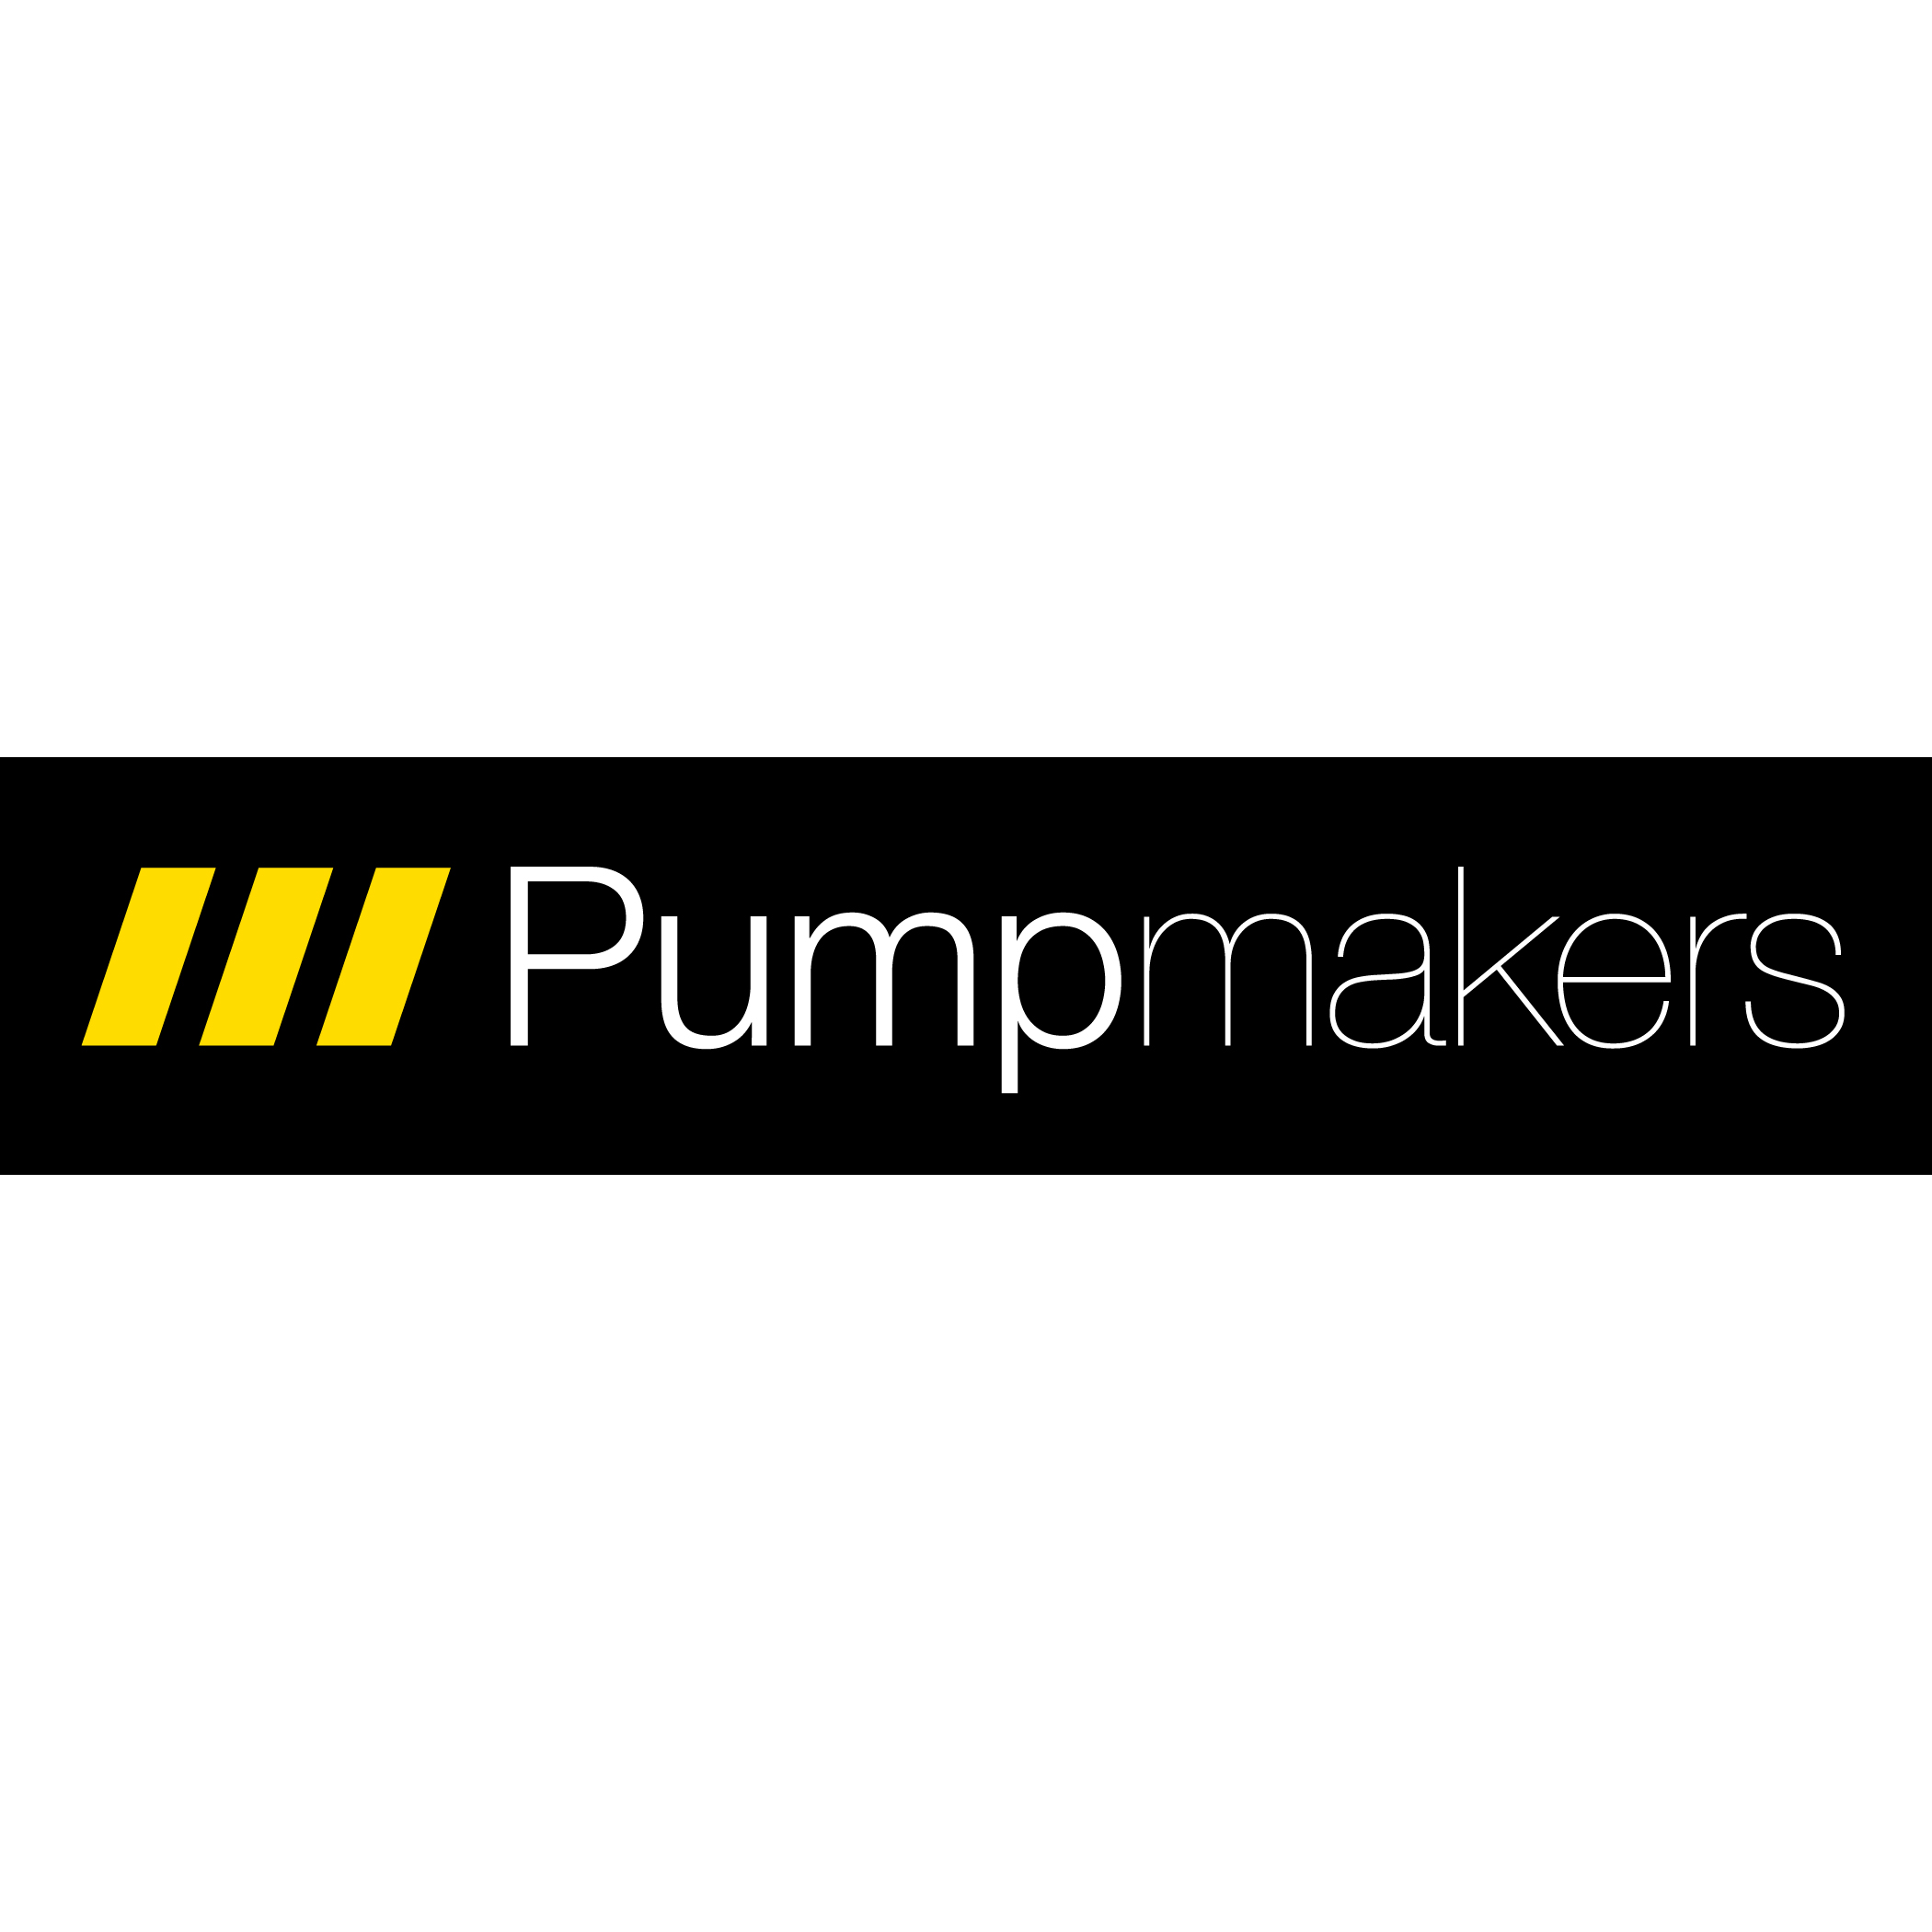 PM Pumpmakers GmbH